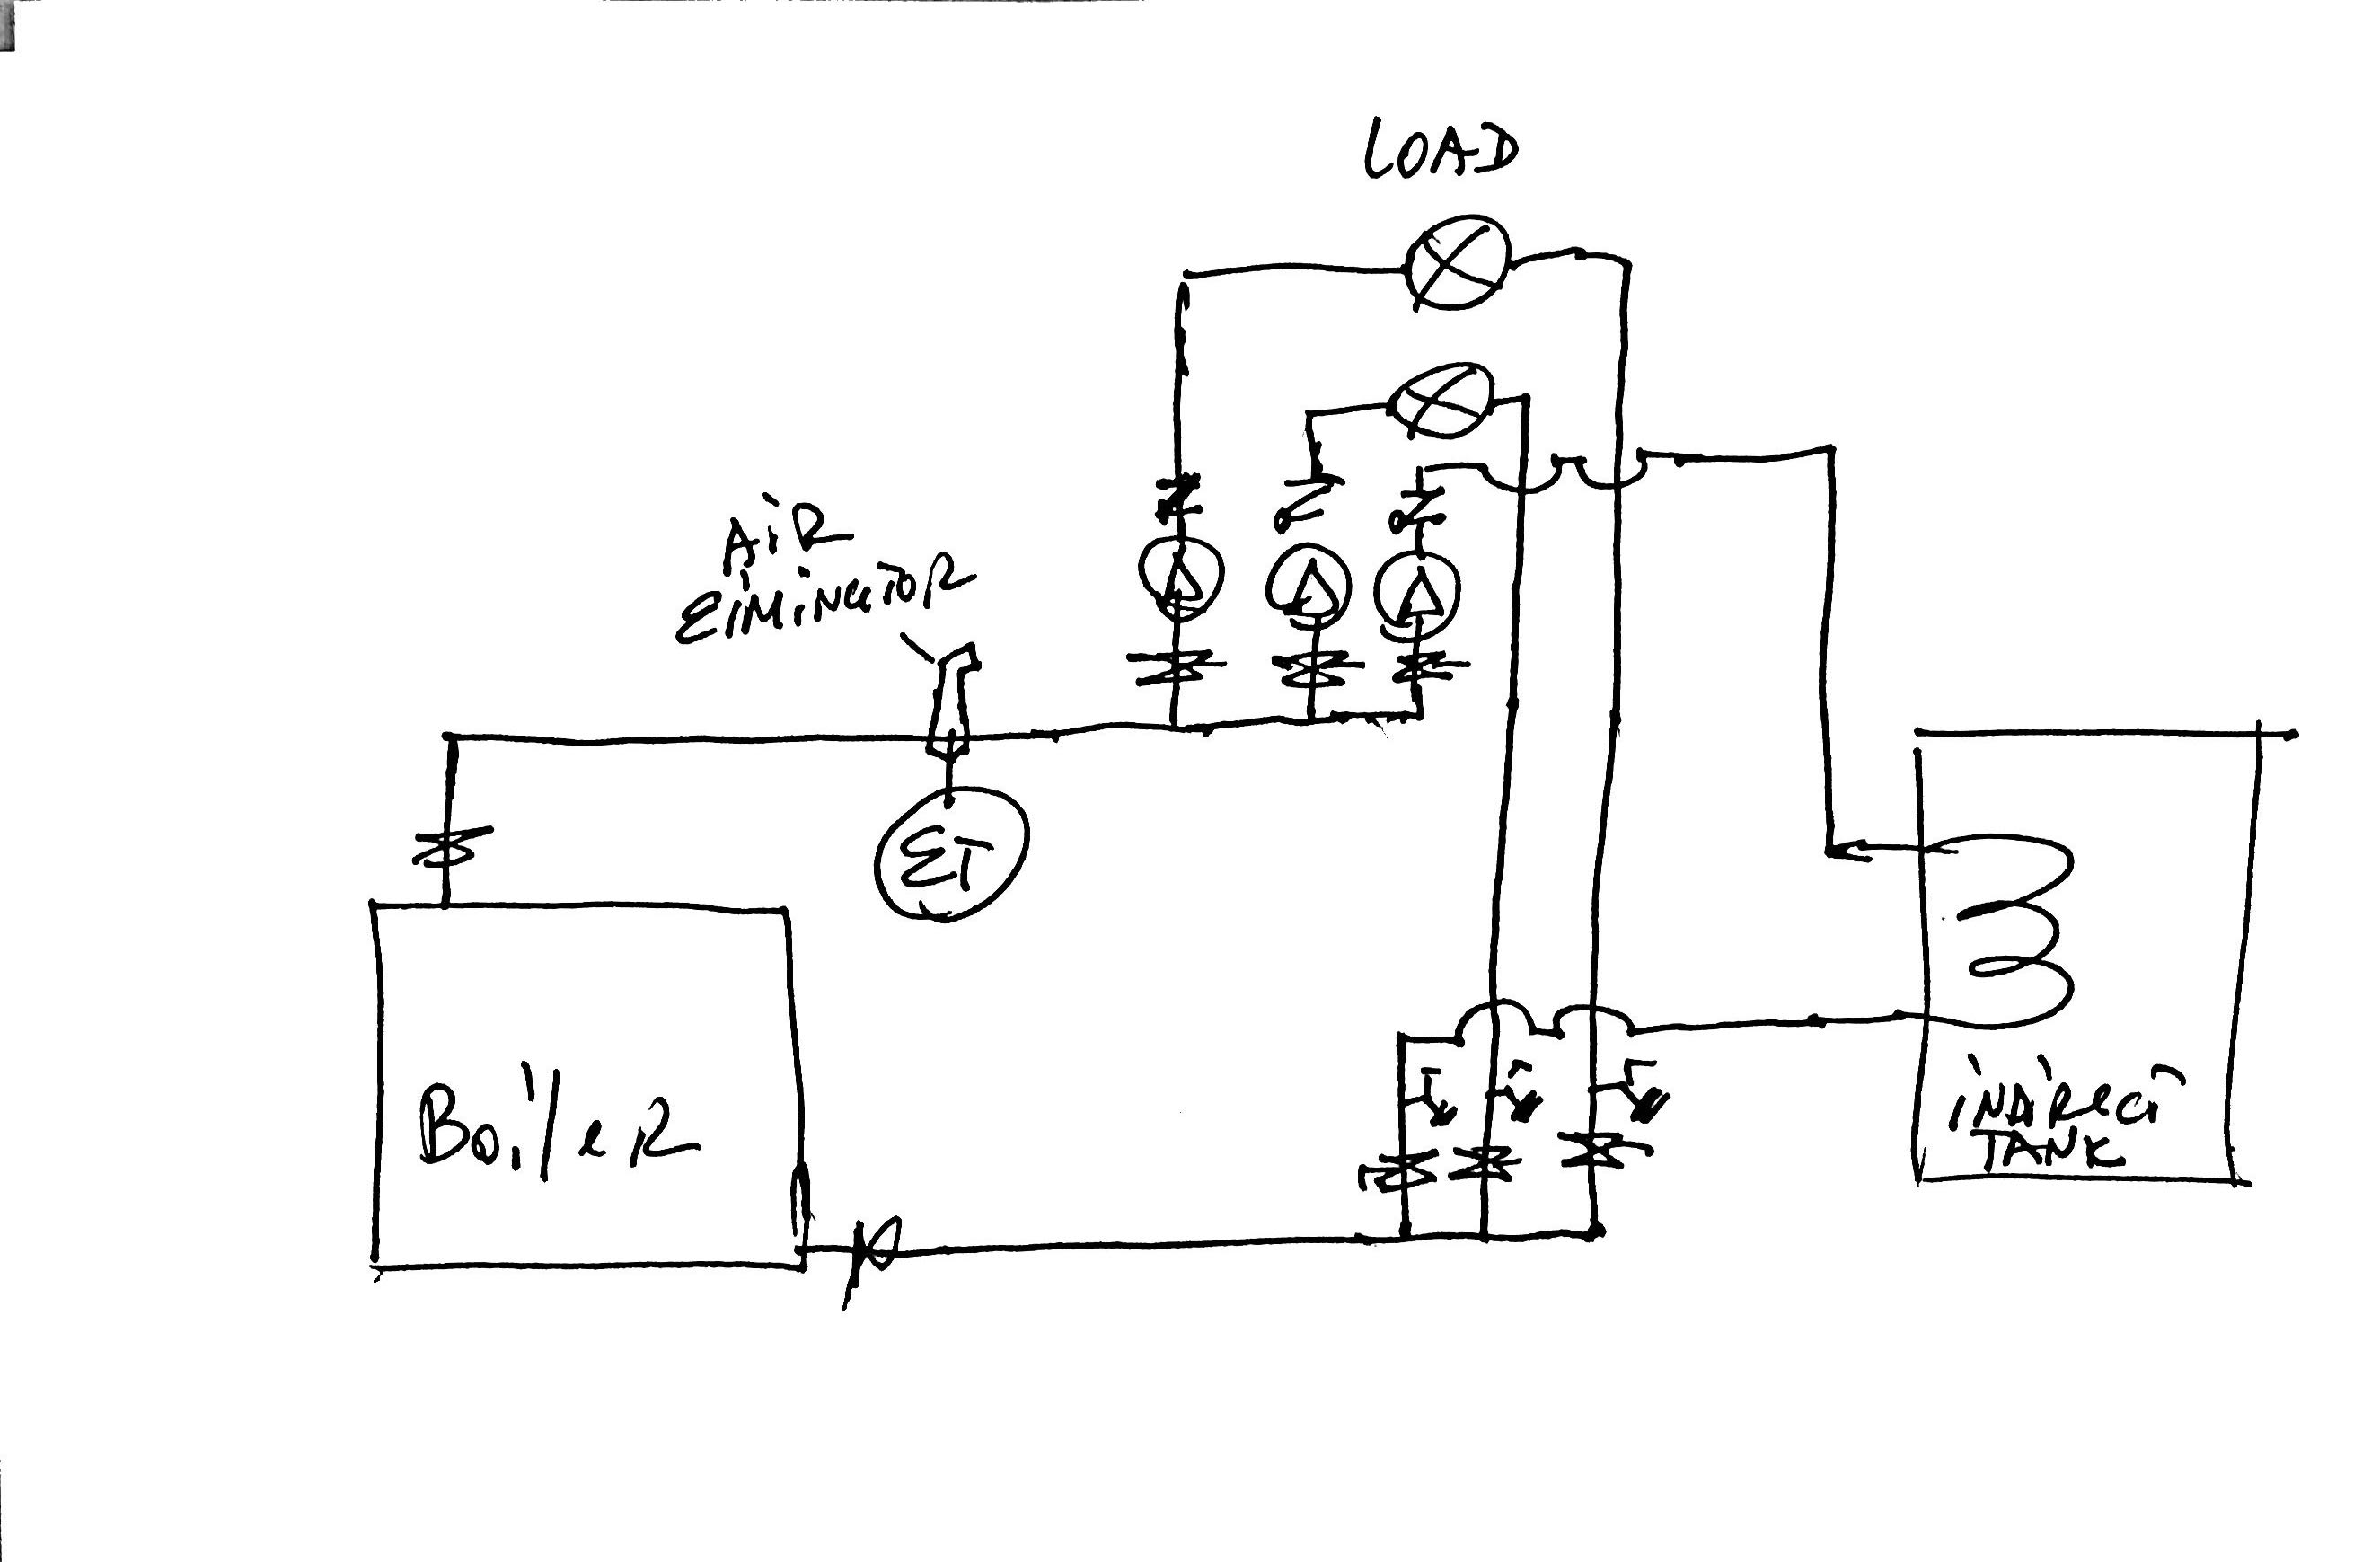 Wiring Diagram For 1977 1978 Kawasaki Kz1000 And Kz1000ltd